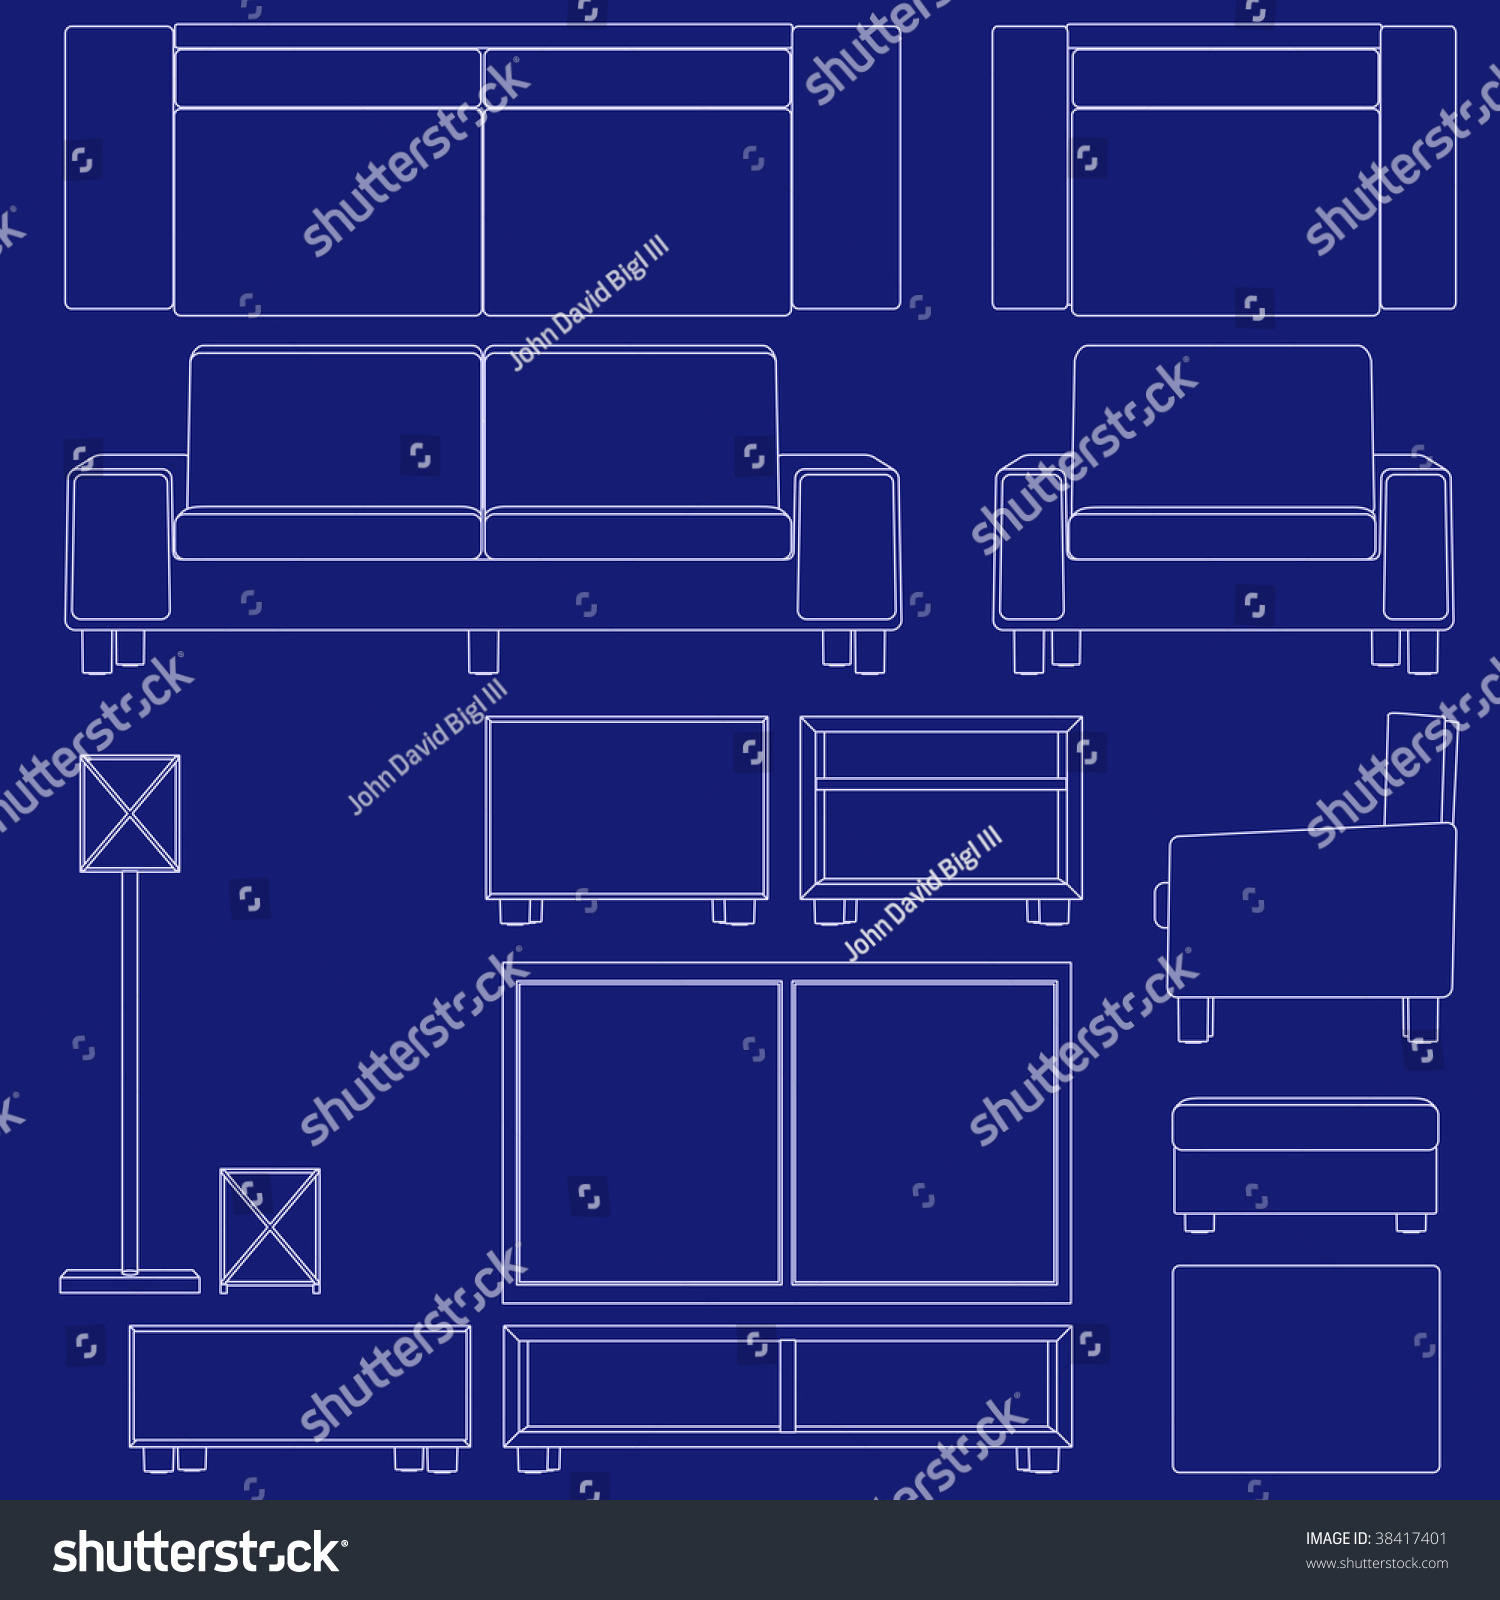 Blueprint living room furniture illustrations raster stock blueprint living room furniture illustrations raster malvernweather Images